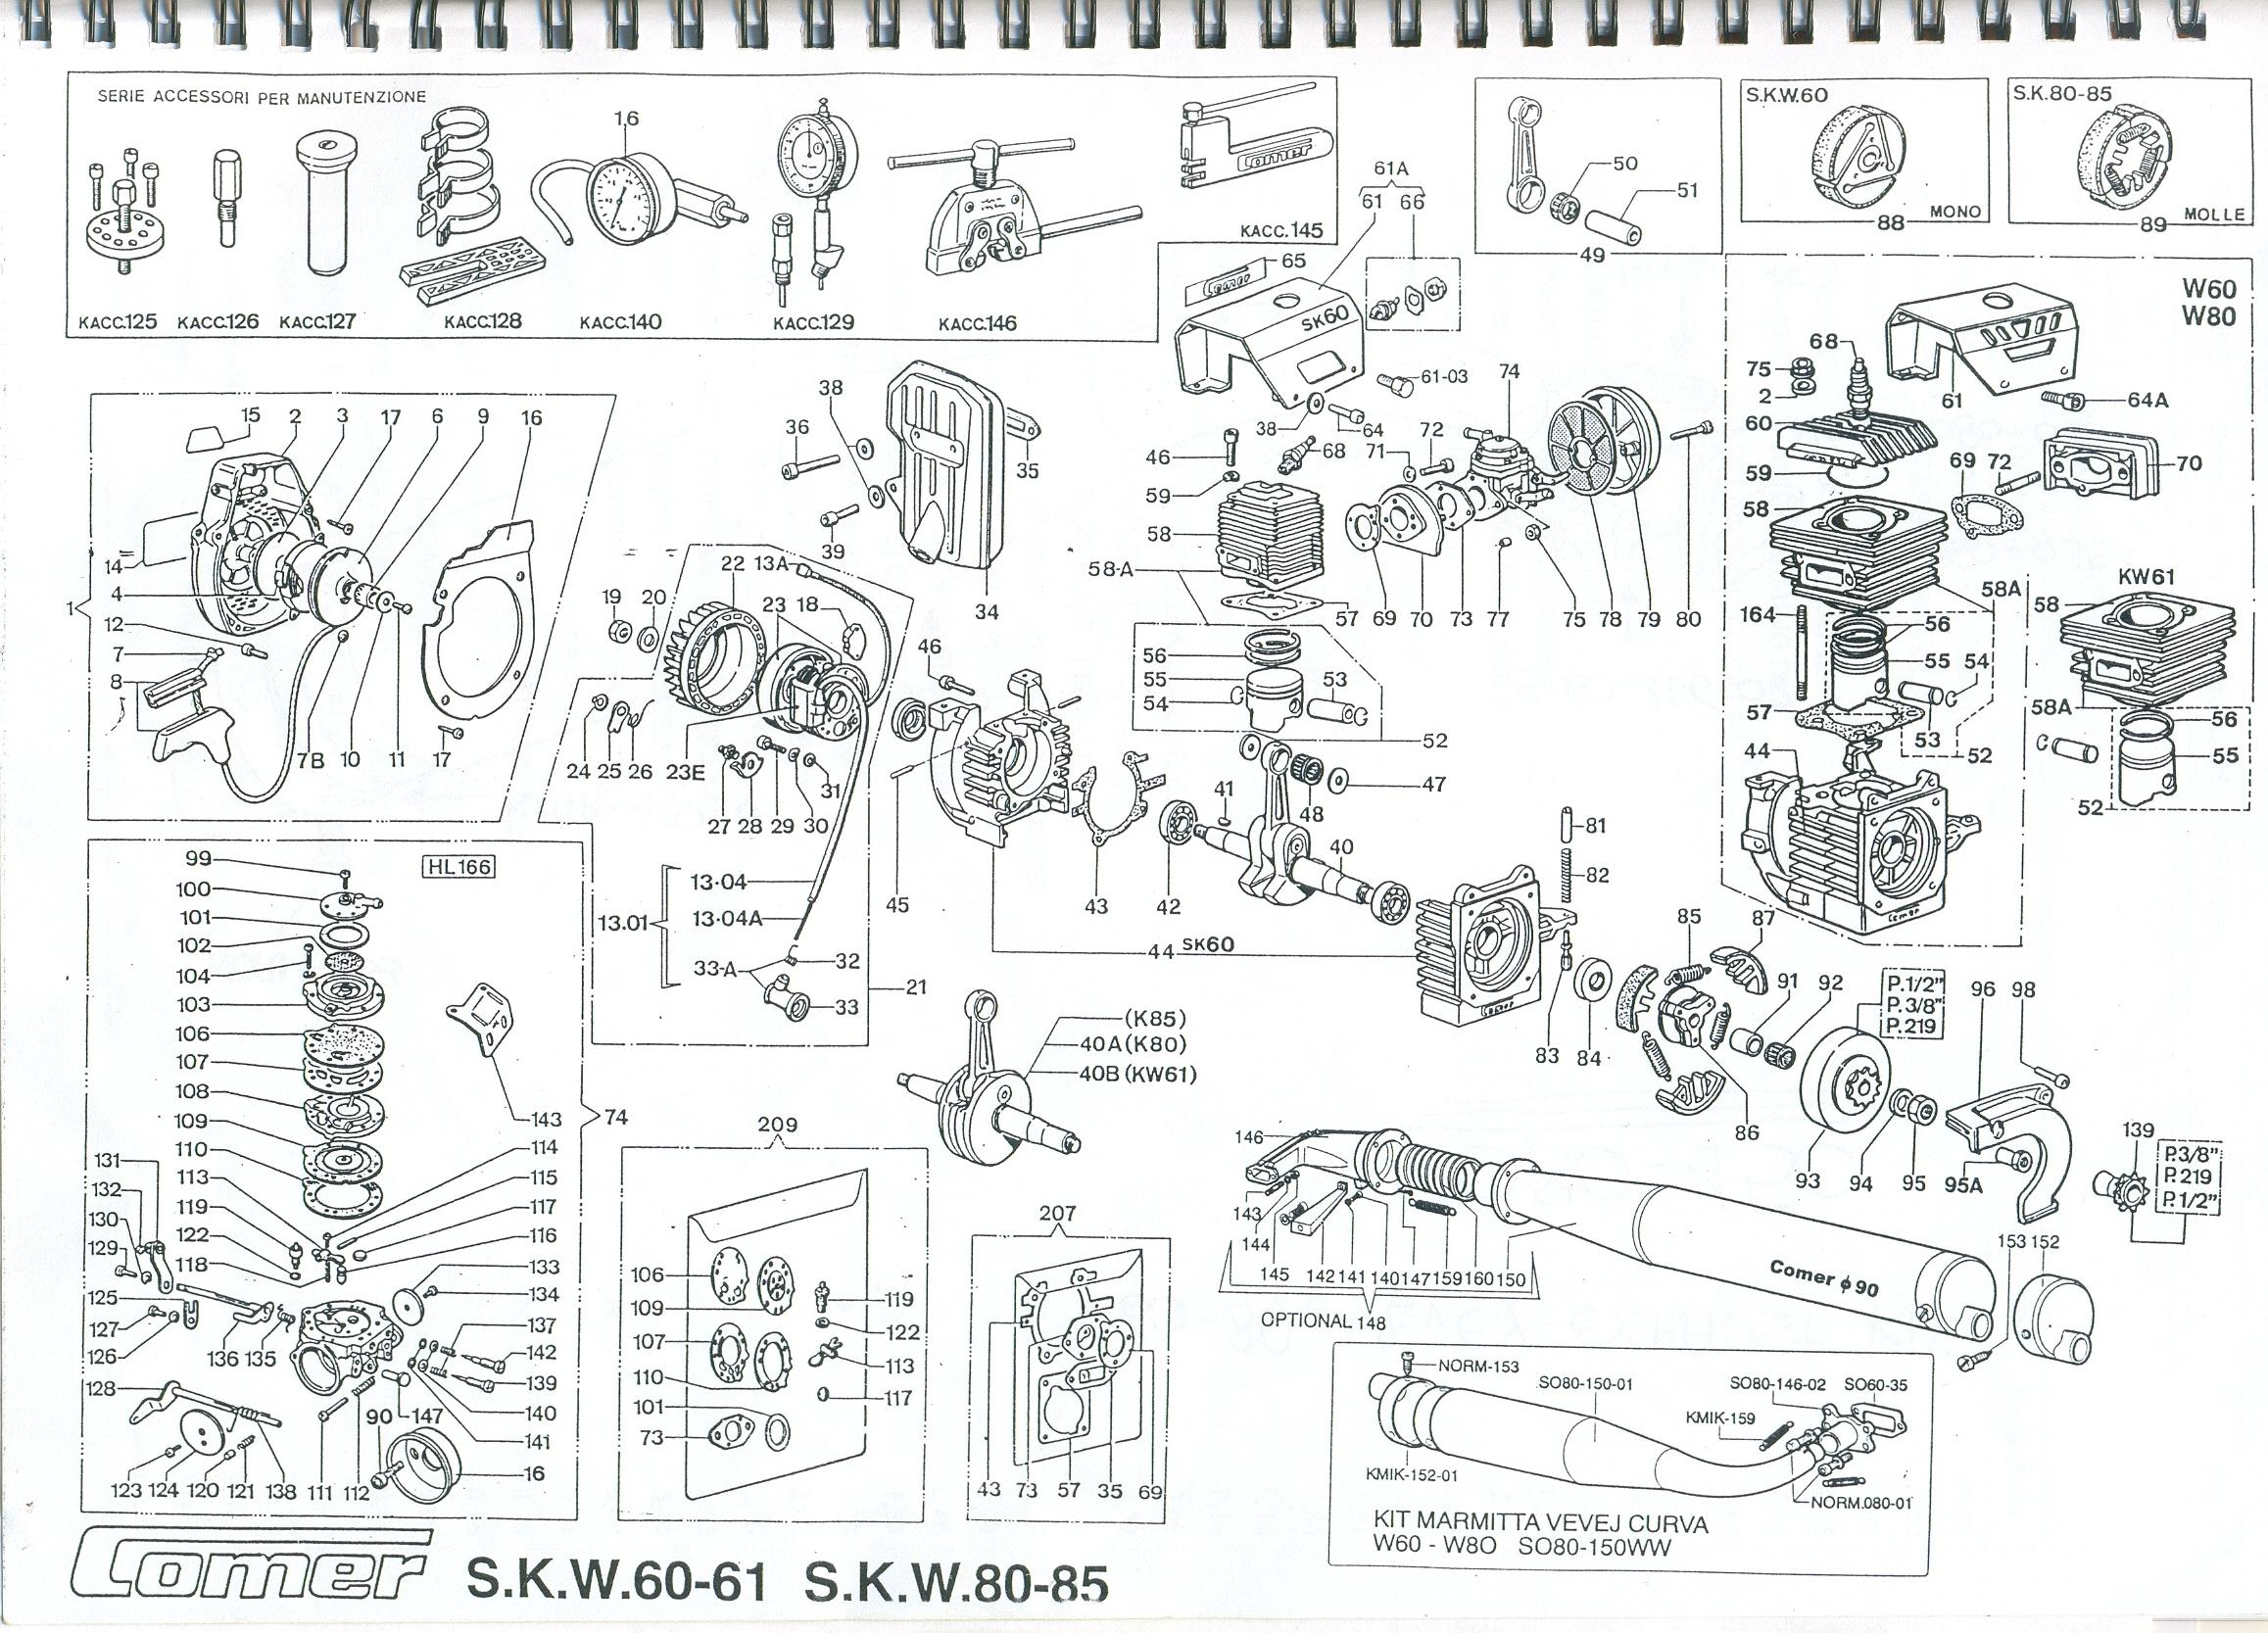 Gas Wiring Diagram Free Download Wiring Diagram Besides Ez Go Gas Golf